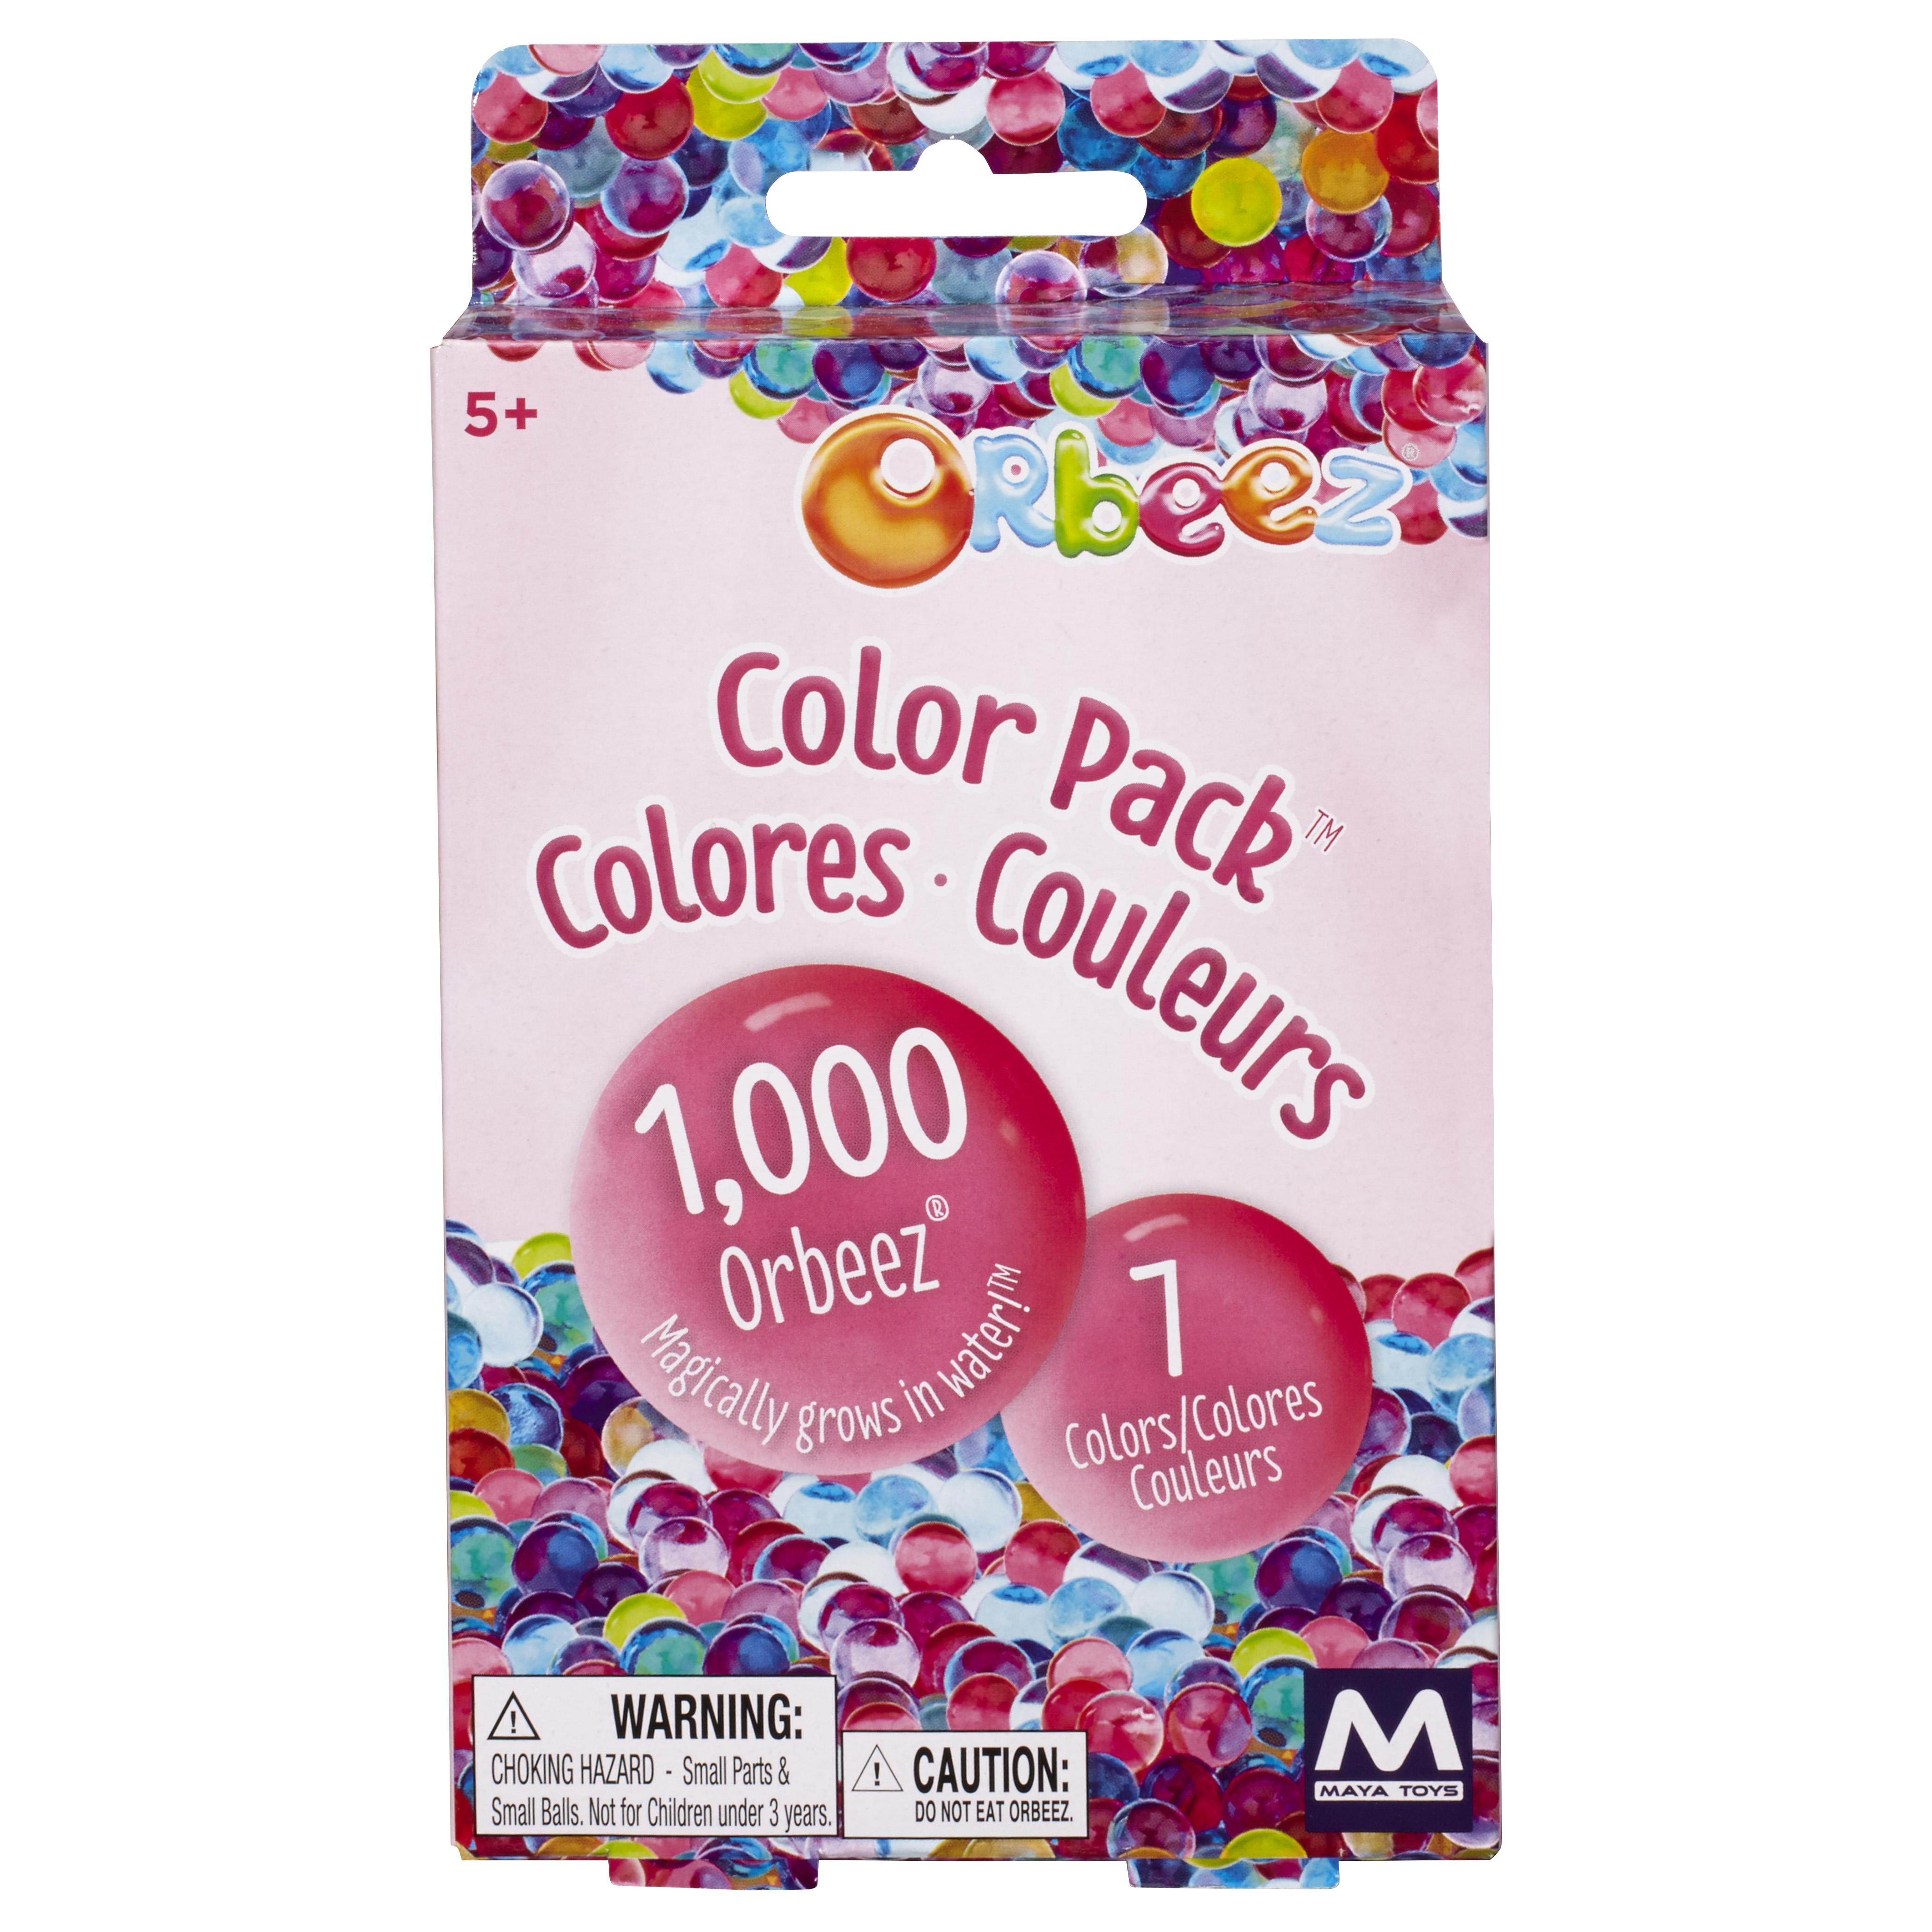 Orbeez Color Pack